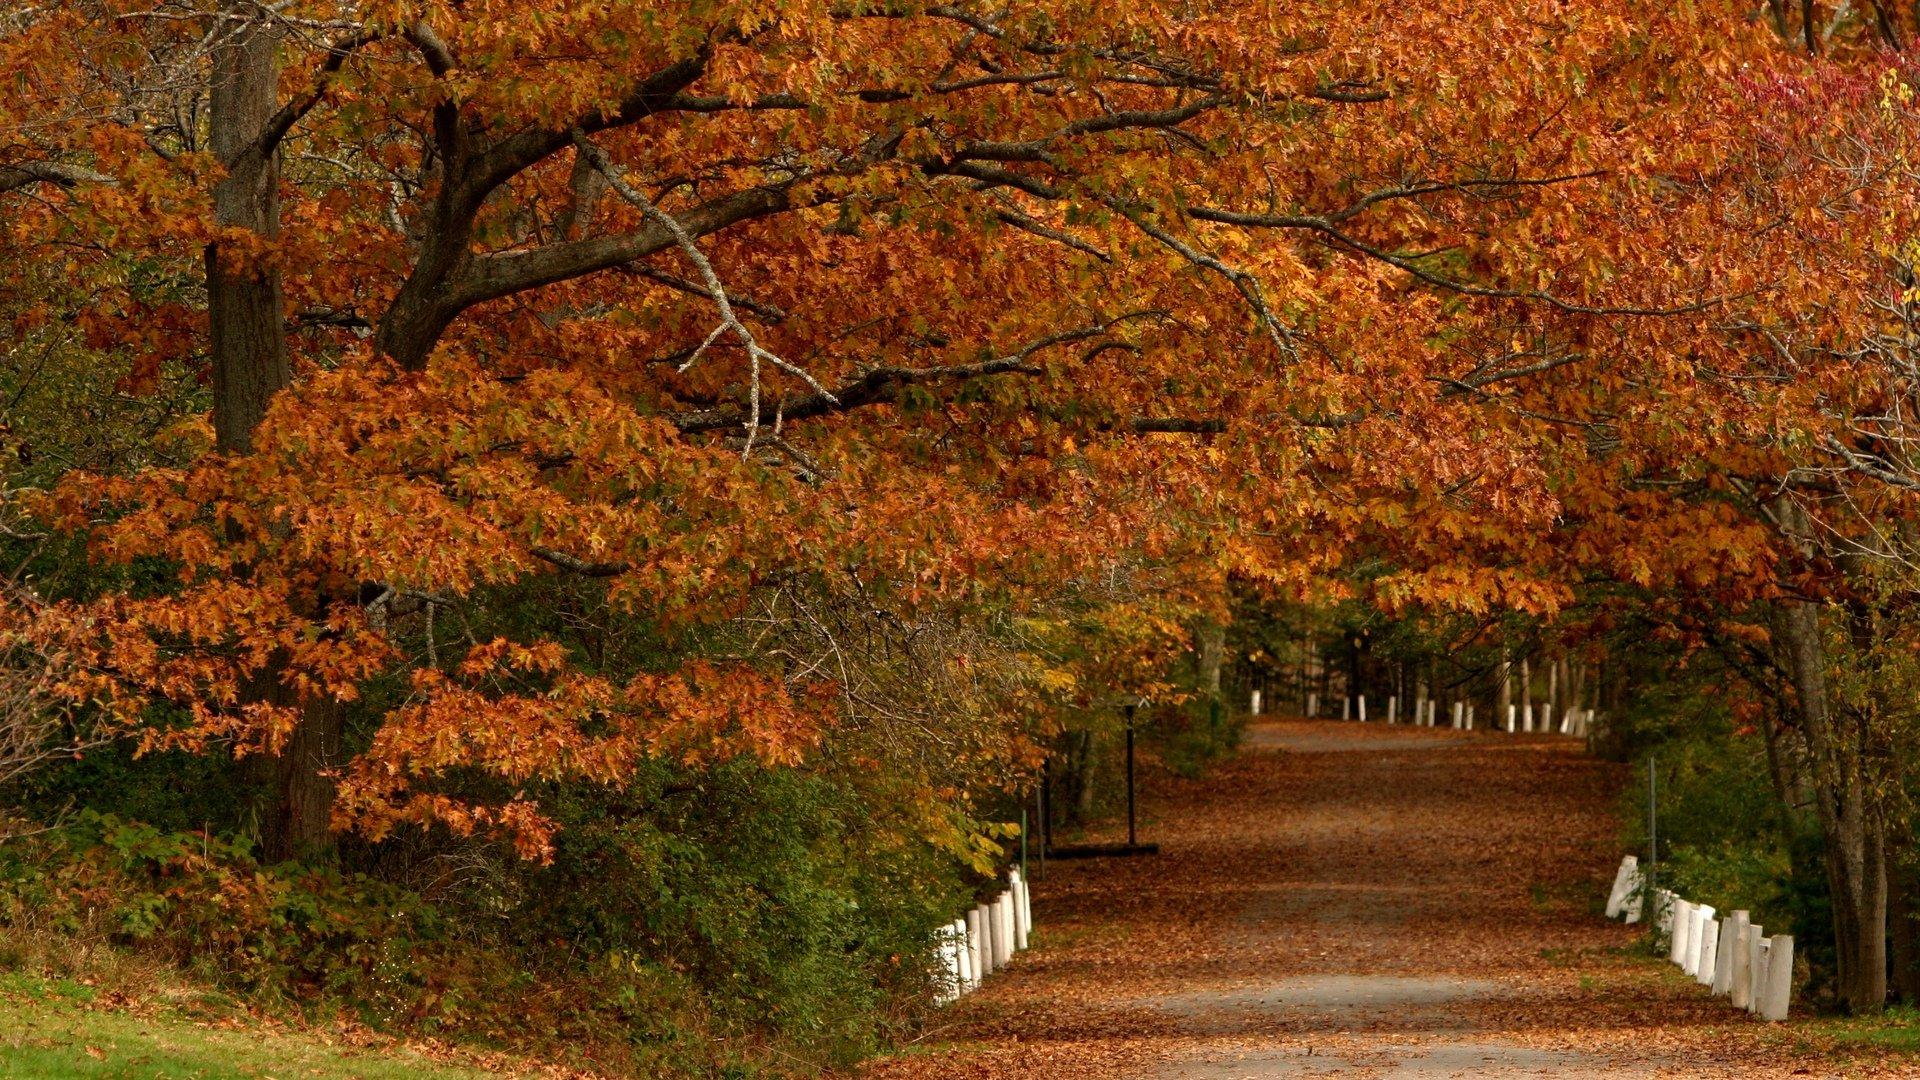 Autumn Scenes wallpaper   68741 1920x1080